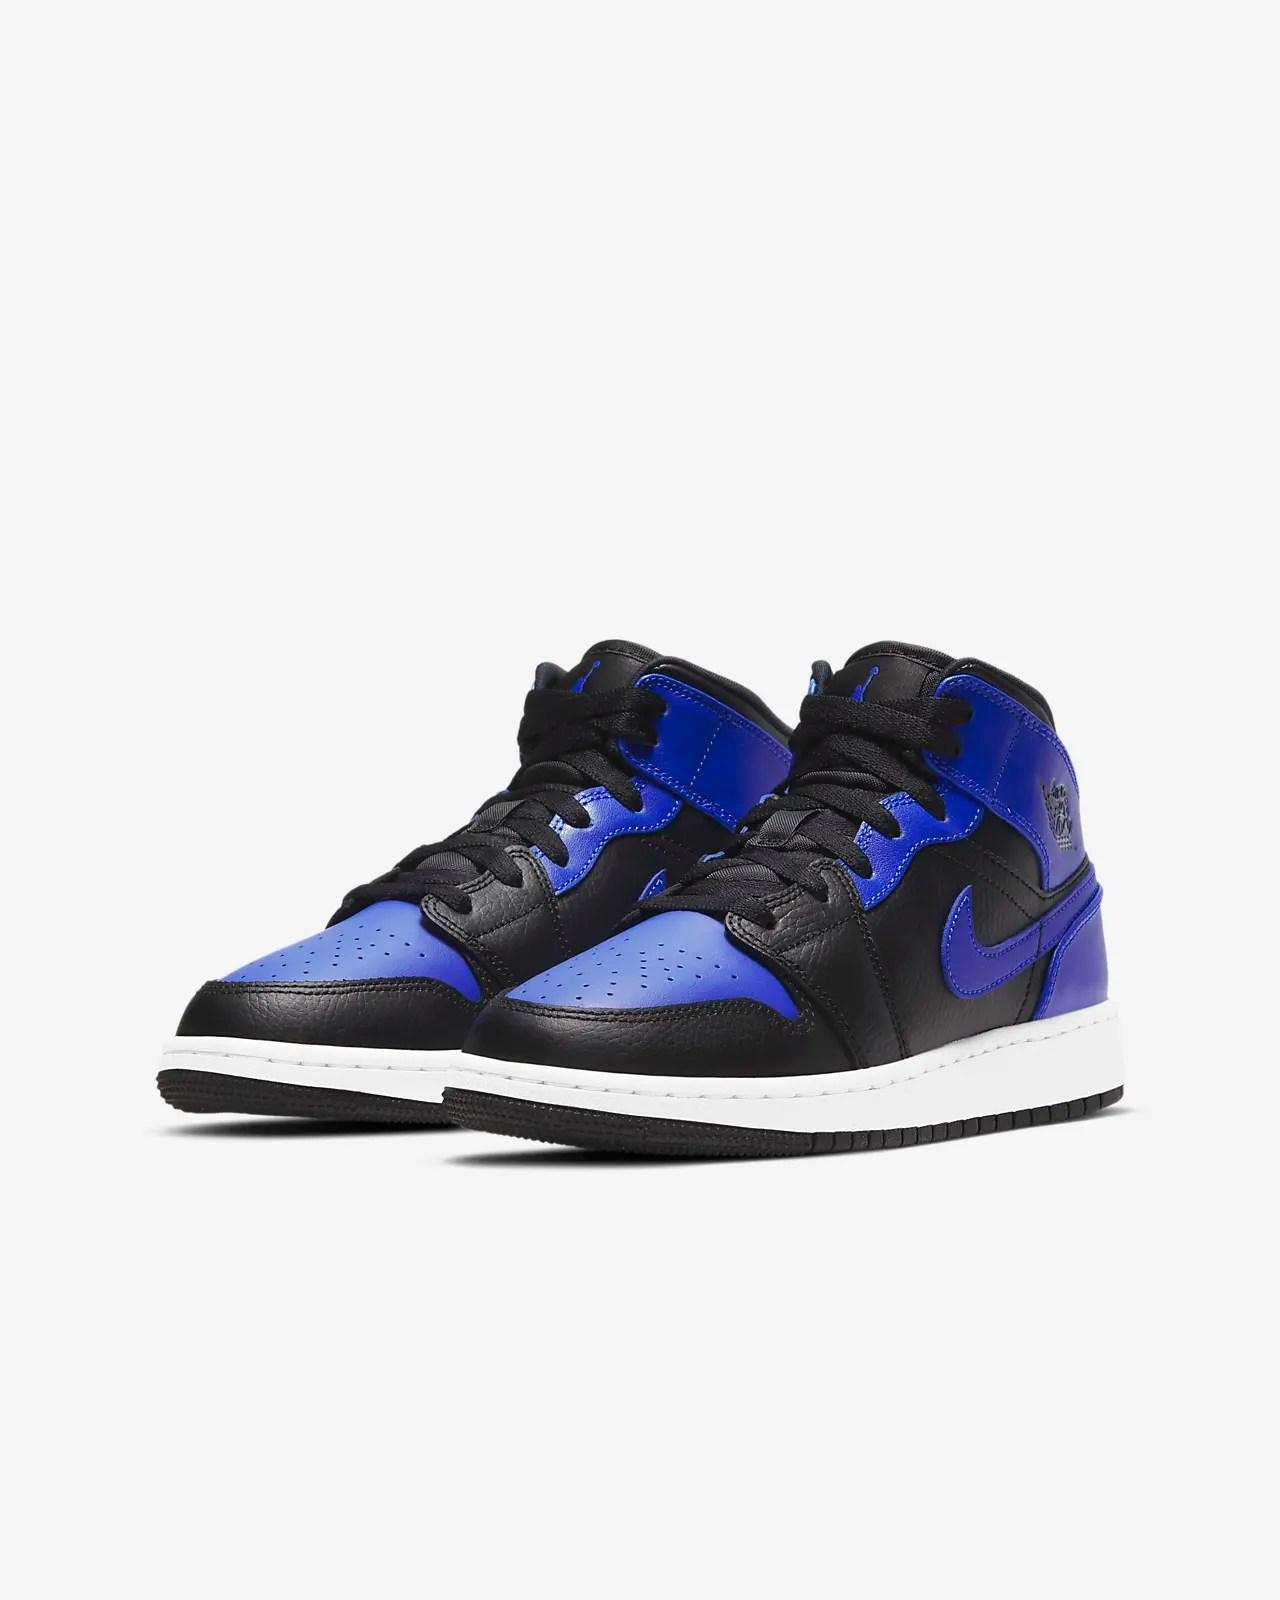 Do Air Jordans Run Big Or Small : jordans, small, Jordan, Kids', Shoe., Nike.com